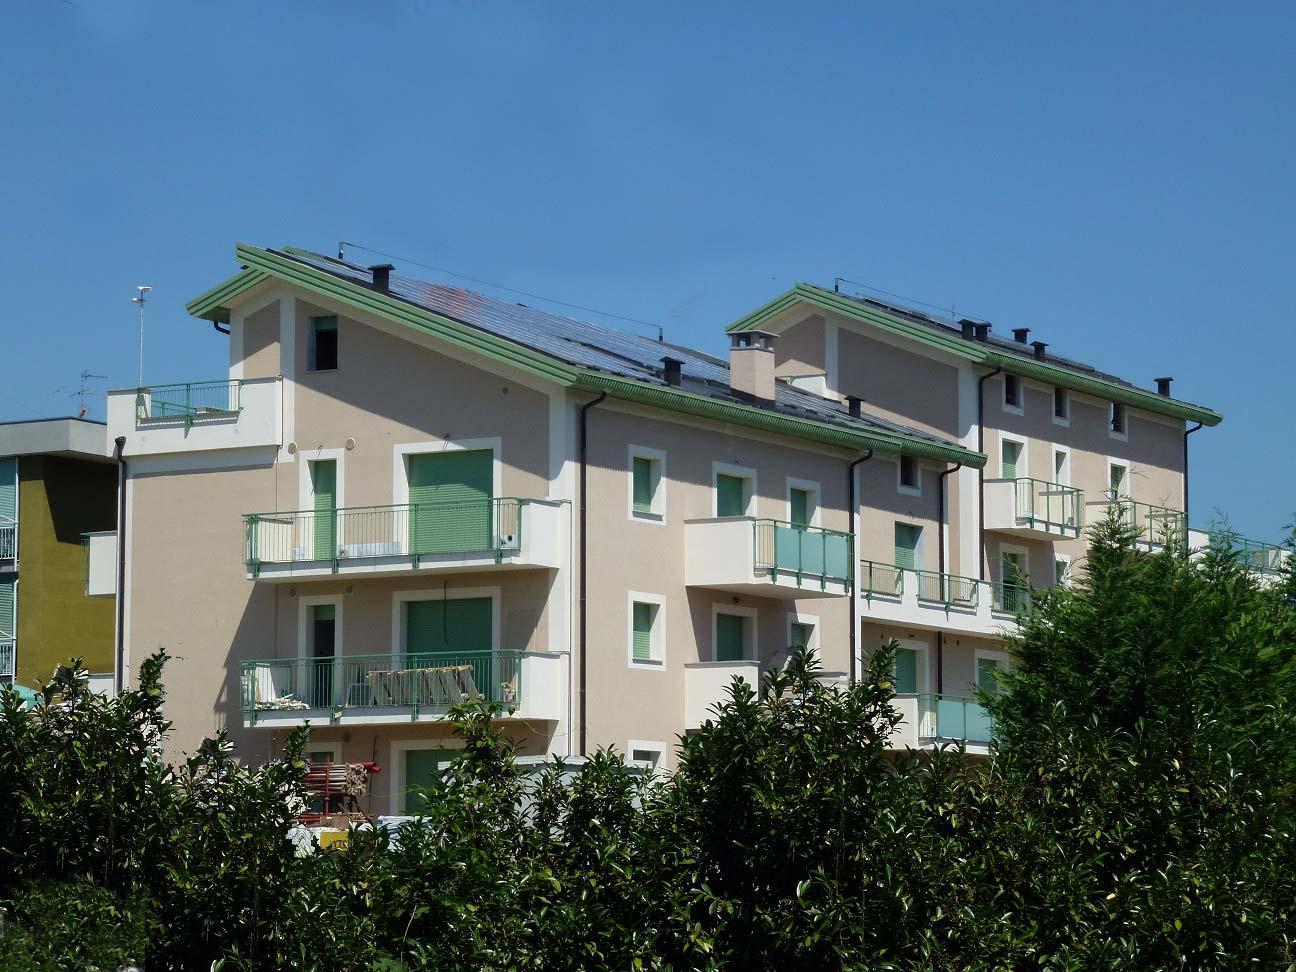 Agenzie immobiliari - Agenzie immobiliari putignano ...